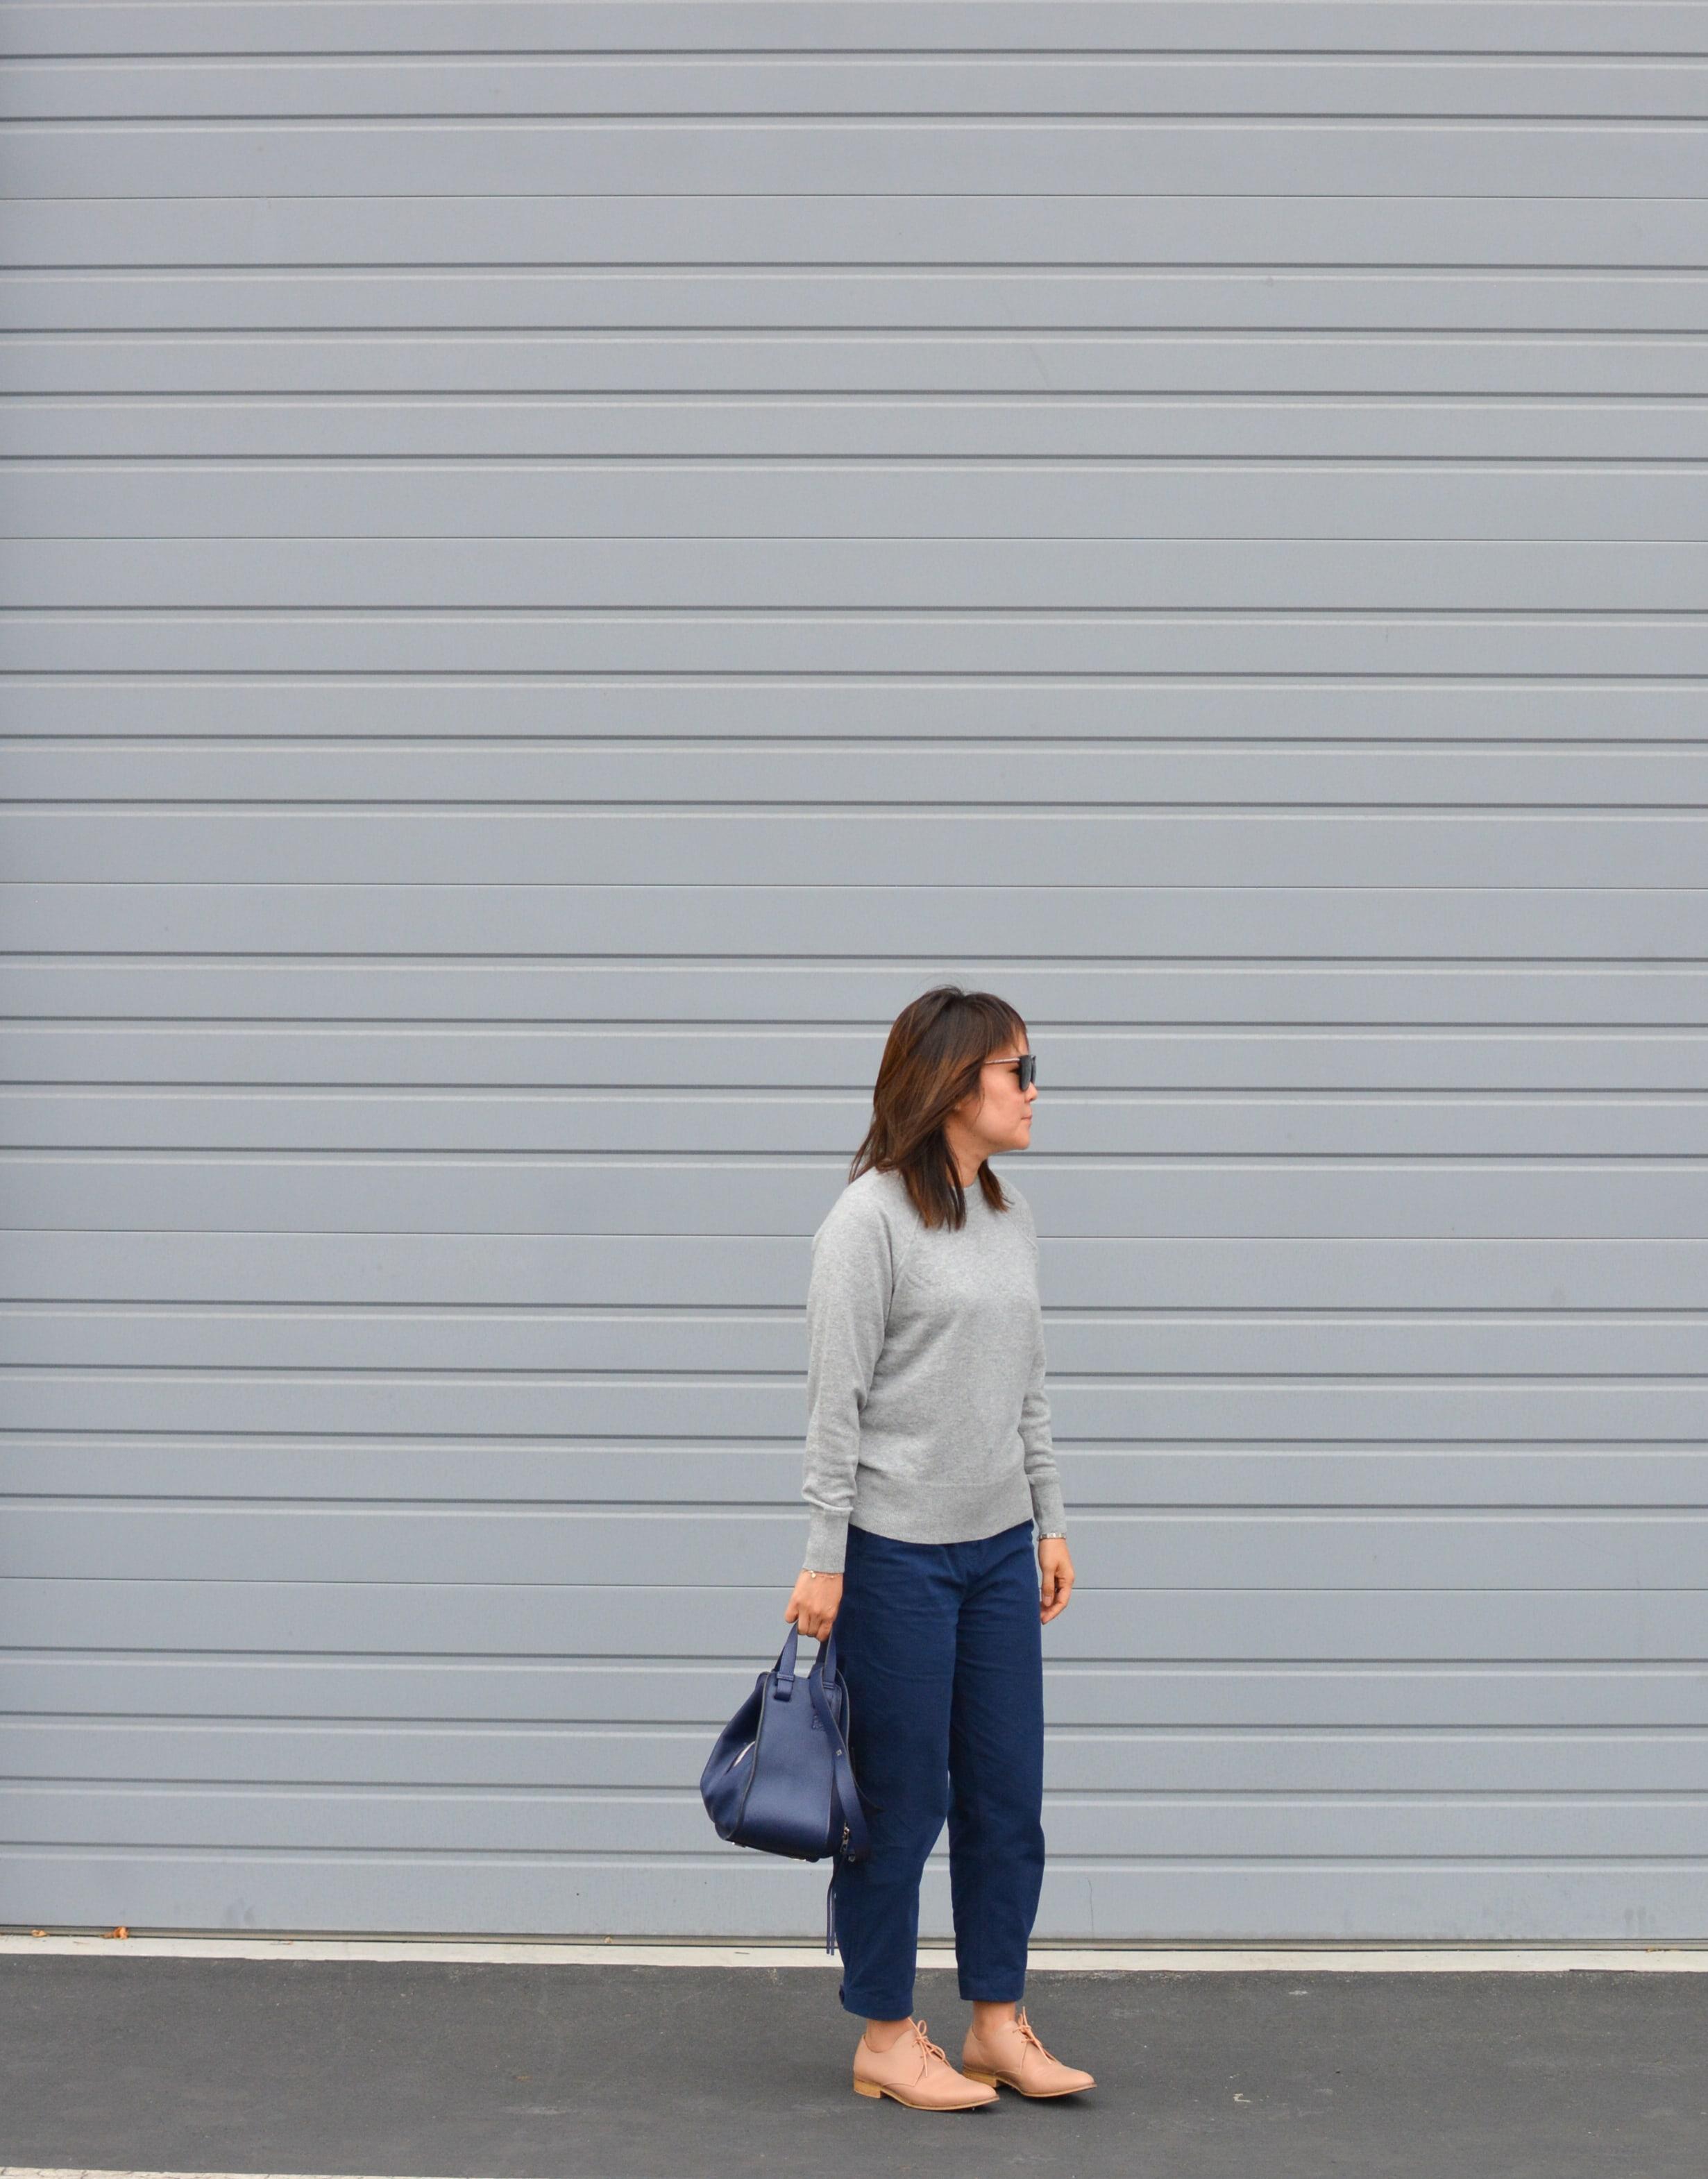 Everlane Review The Cashmere Sweatshirt (1 of 3)-min.jpg